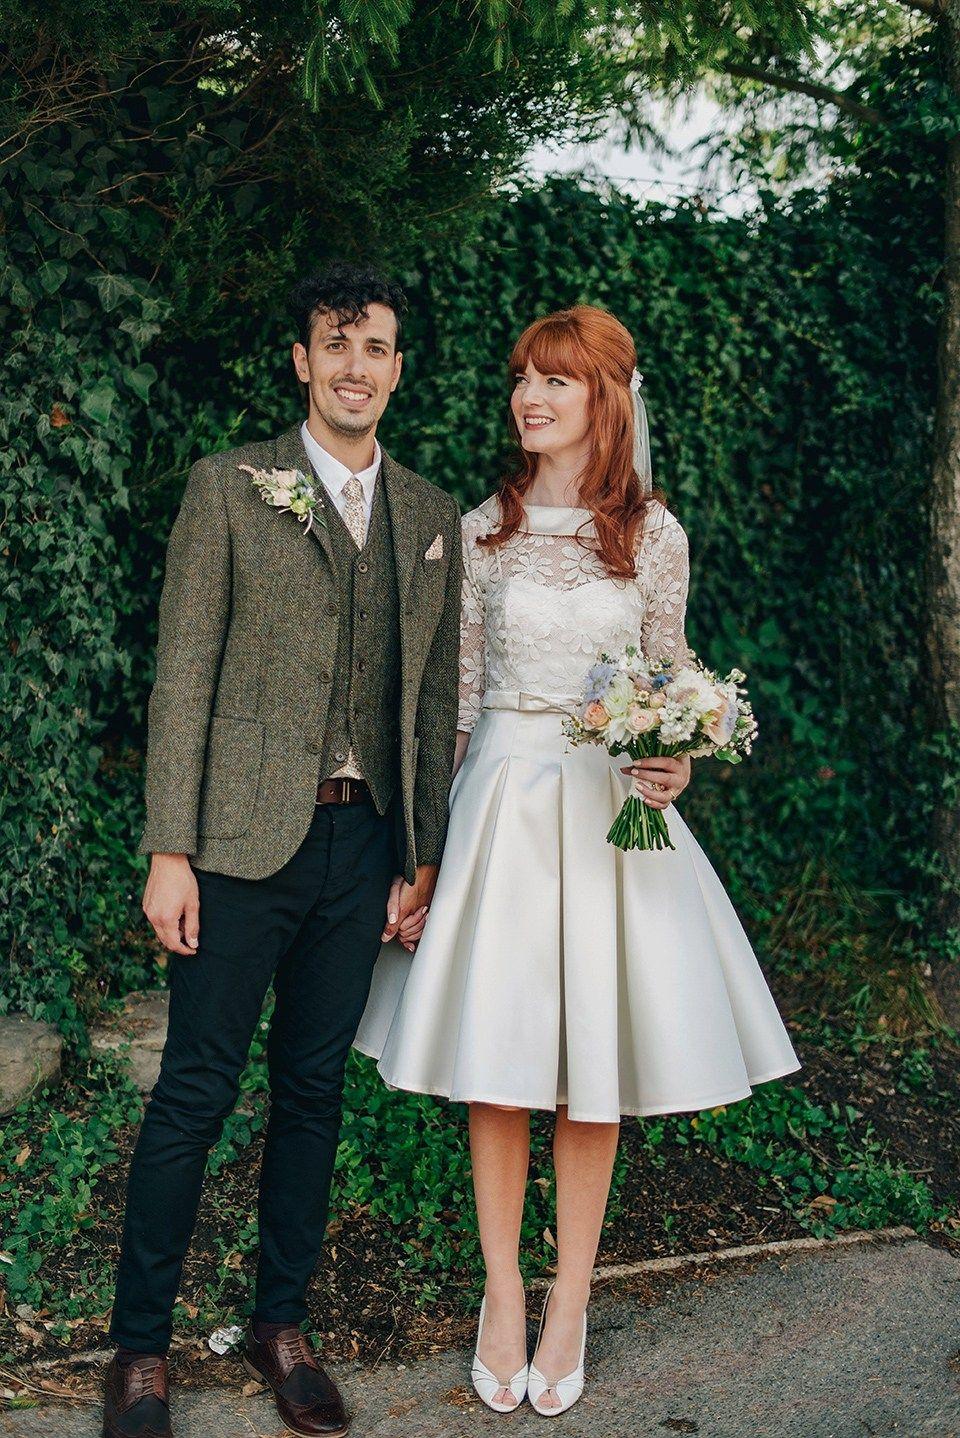 Bride Amy Wears A Replica 1960s Wedding Dress Designed By Fur Coat No Knickers